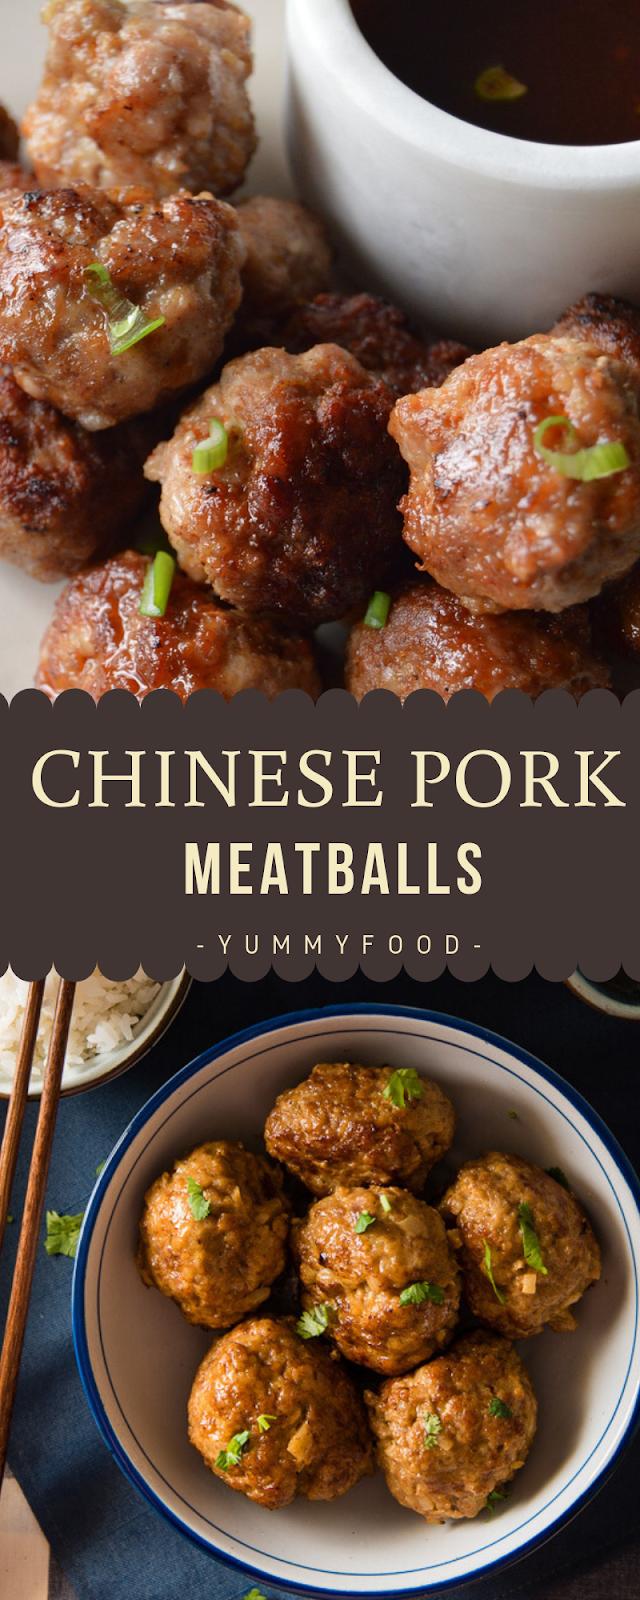 Chinese Pork Meatballs